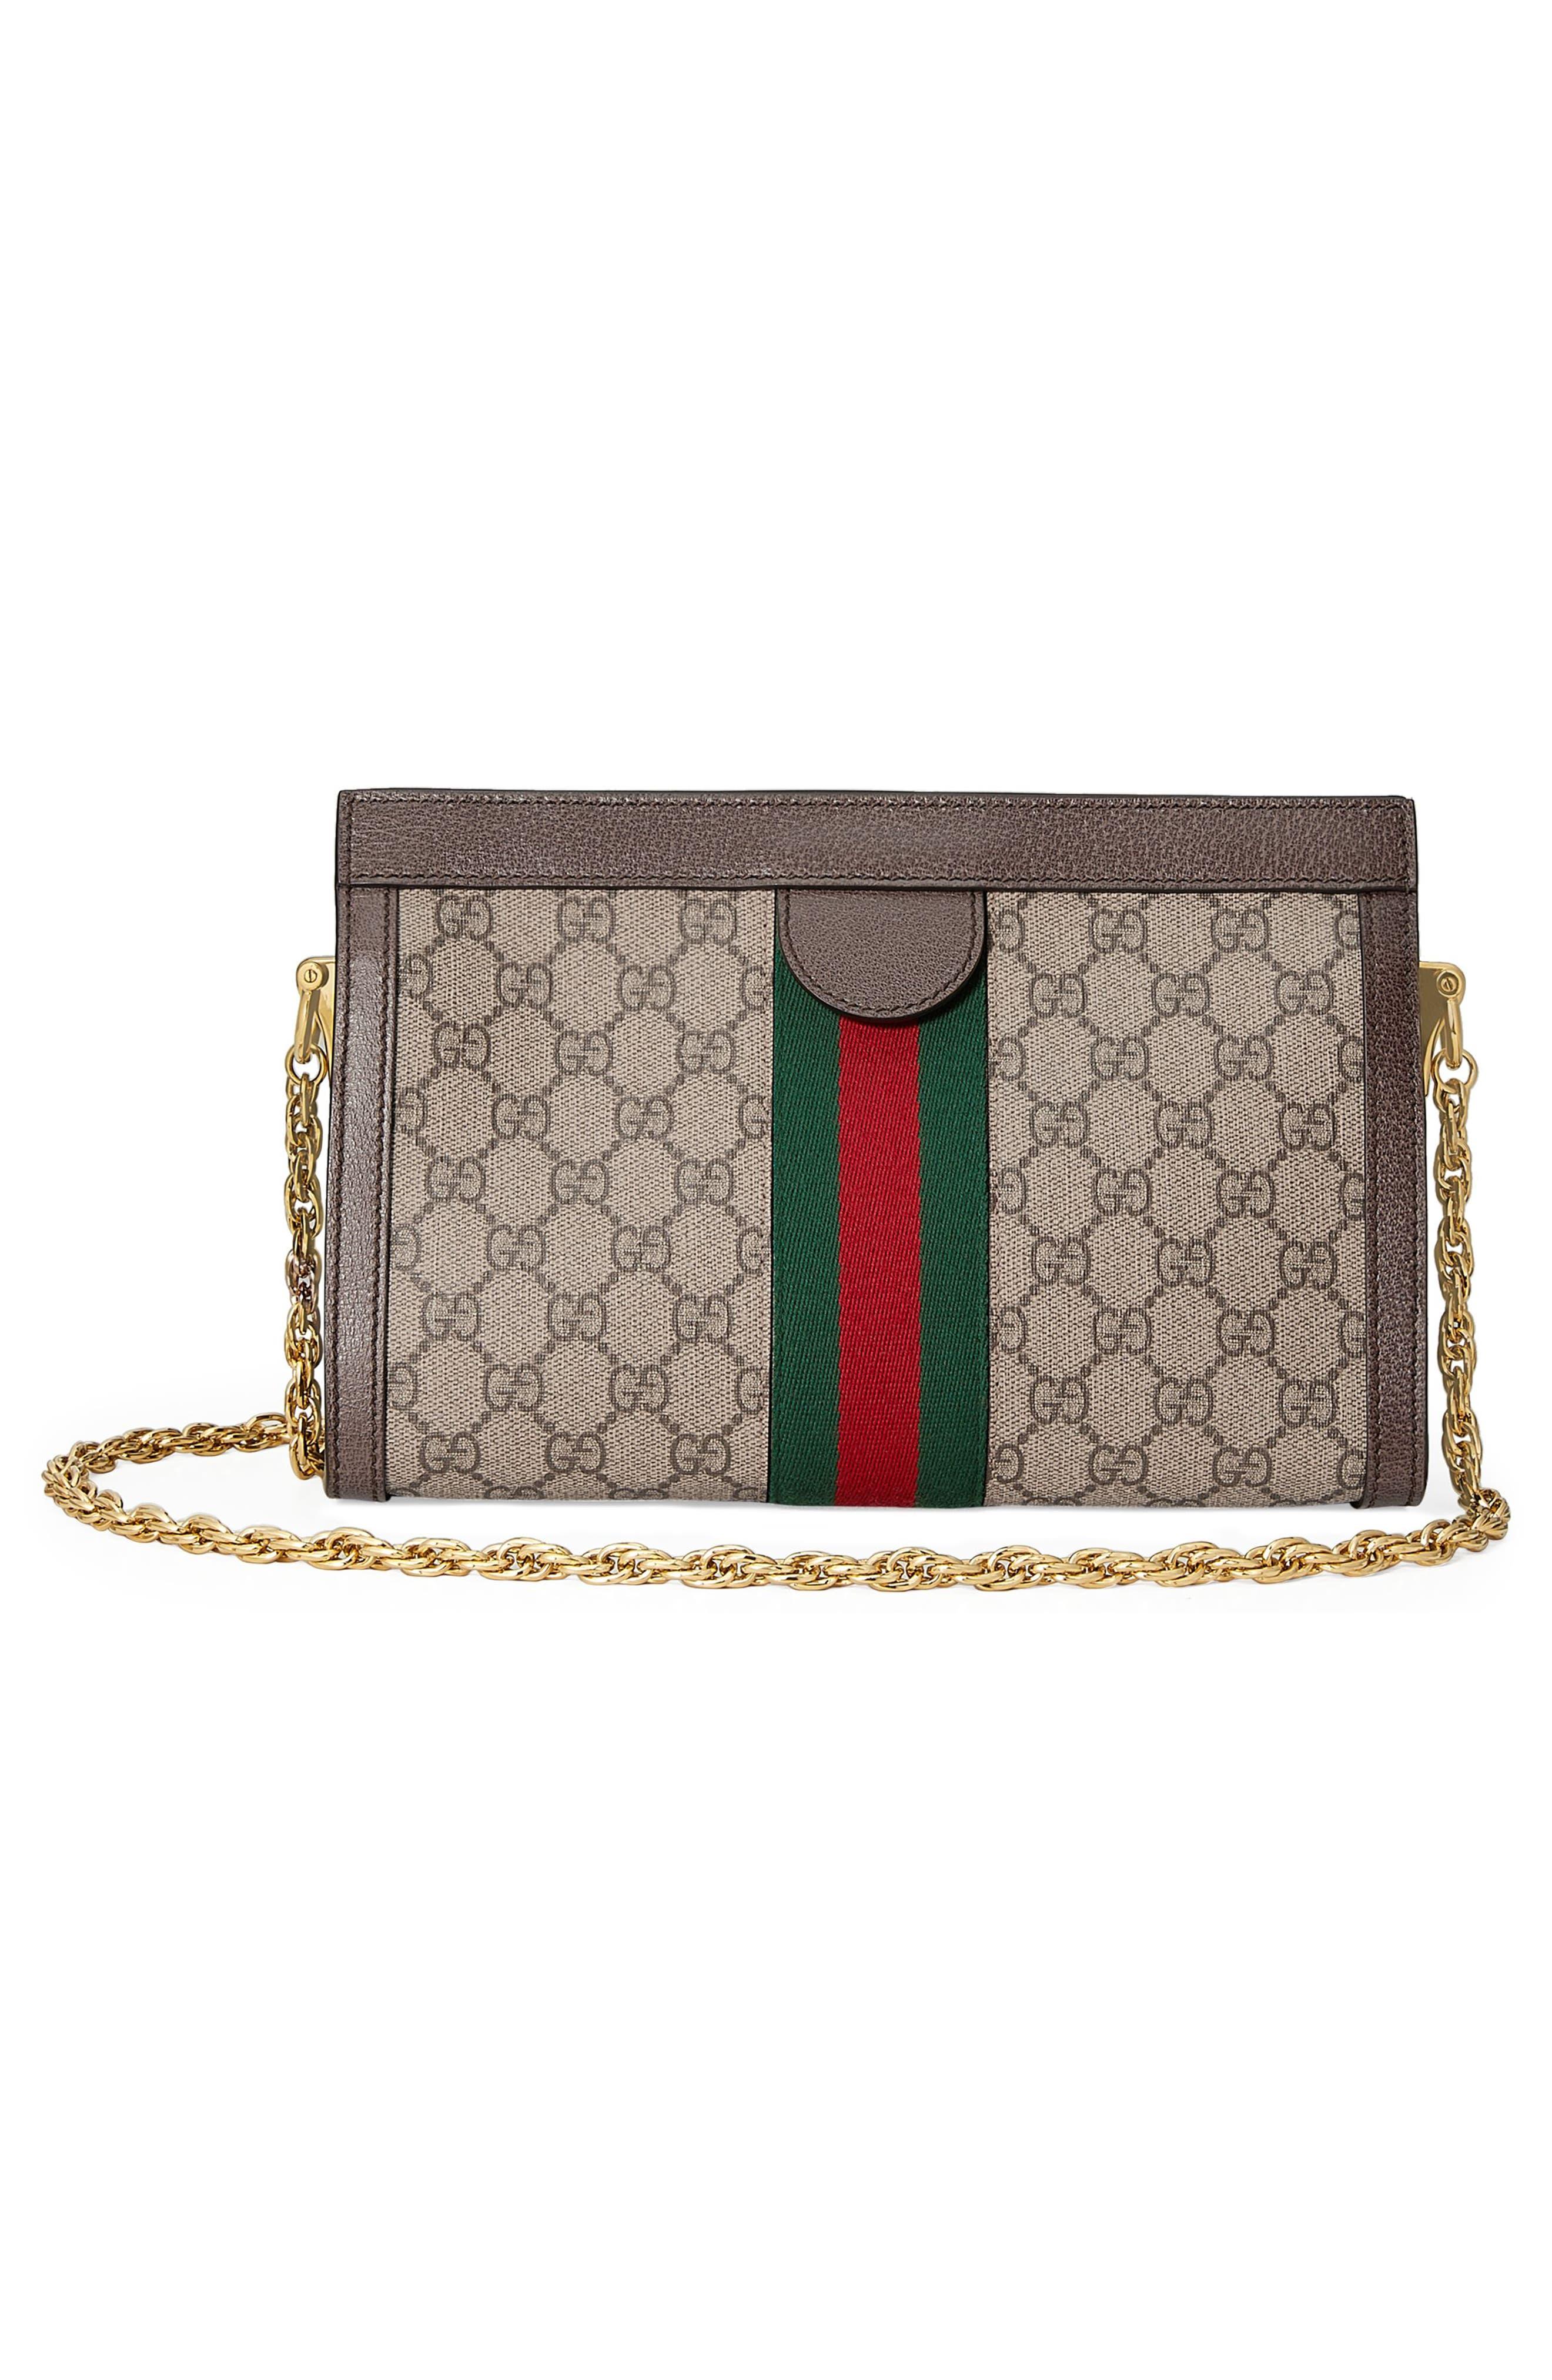 GUCCI, Small GG Supreme Shoulder Bag, Alternate thumbnail 3, color, BEIGE EBONY/ NERO/ VERT/ RED